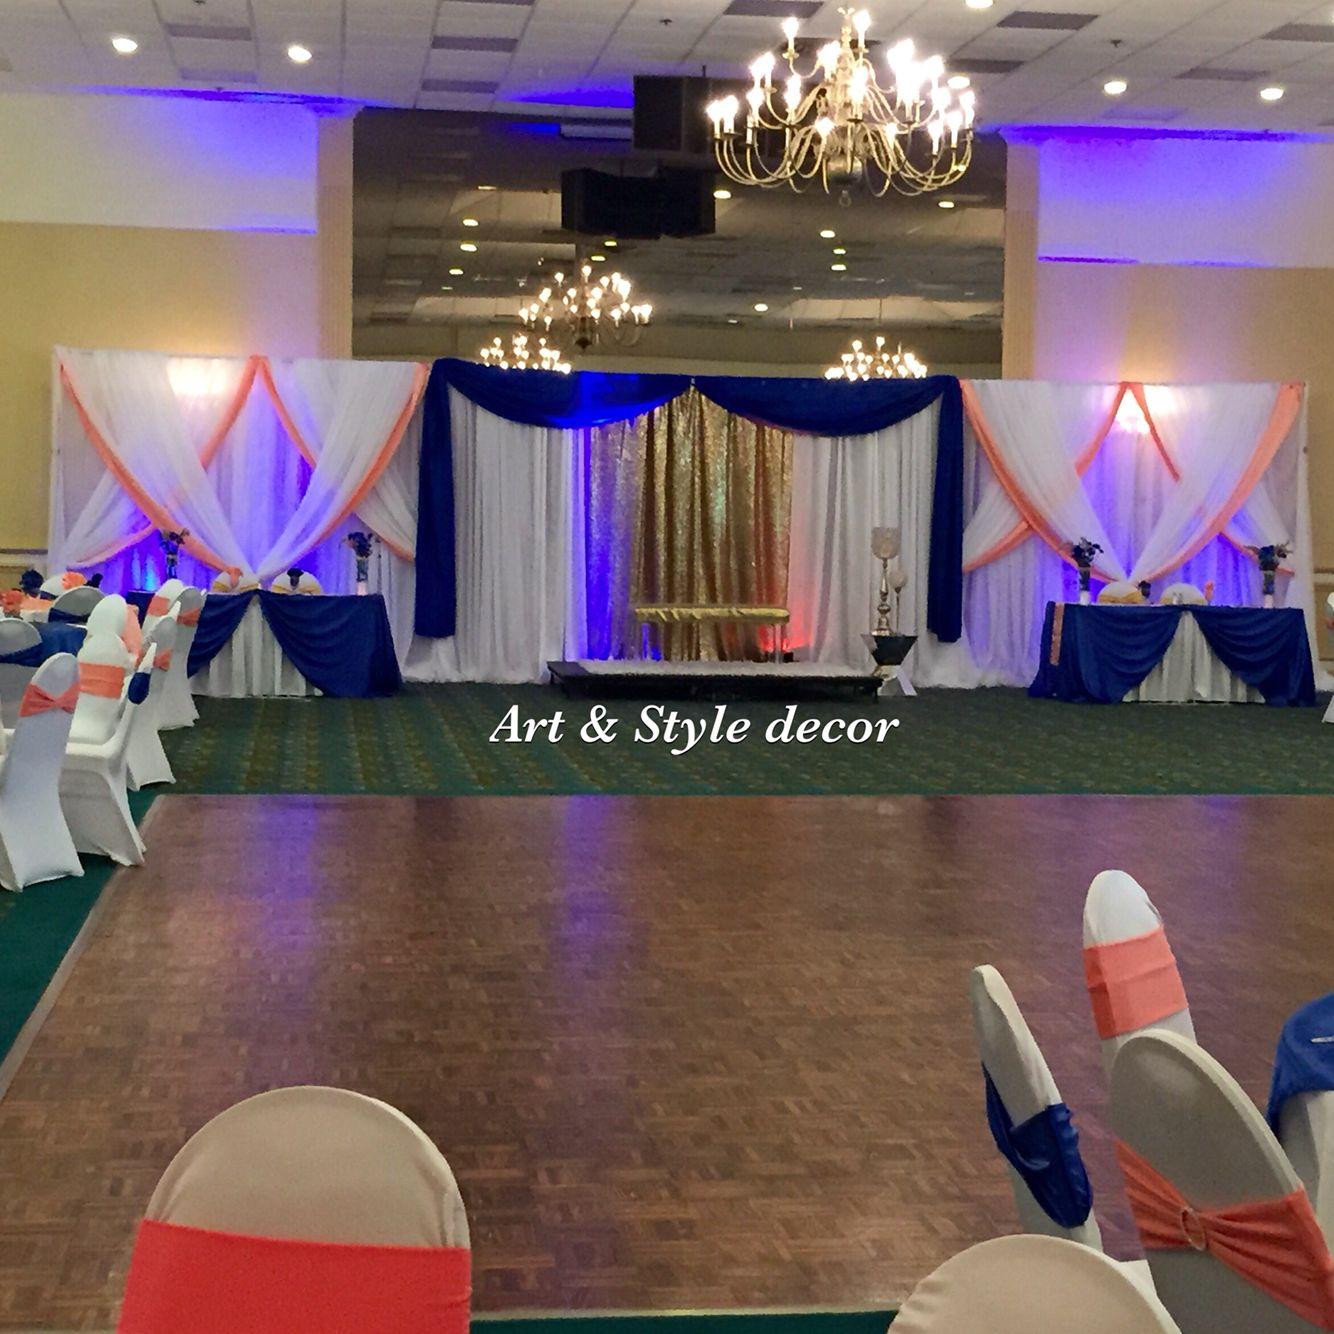 Blue Wedding Decorations: Royal Blue And Coral Wedding Decor. #artandstyledecor